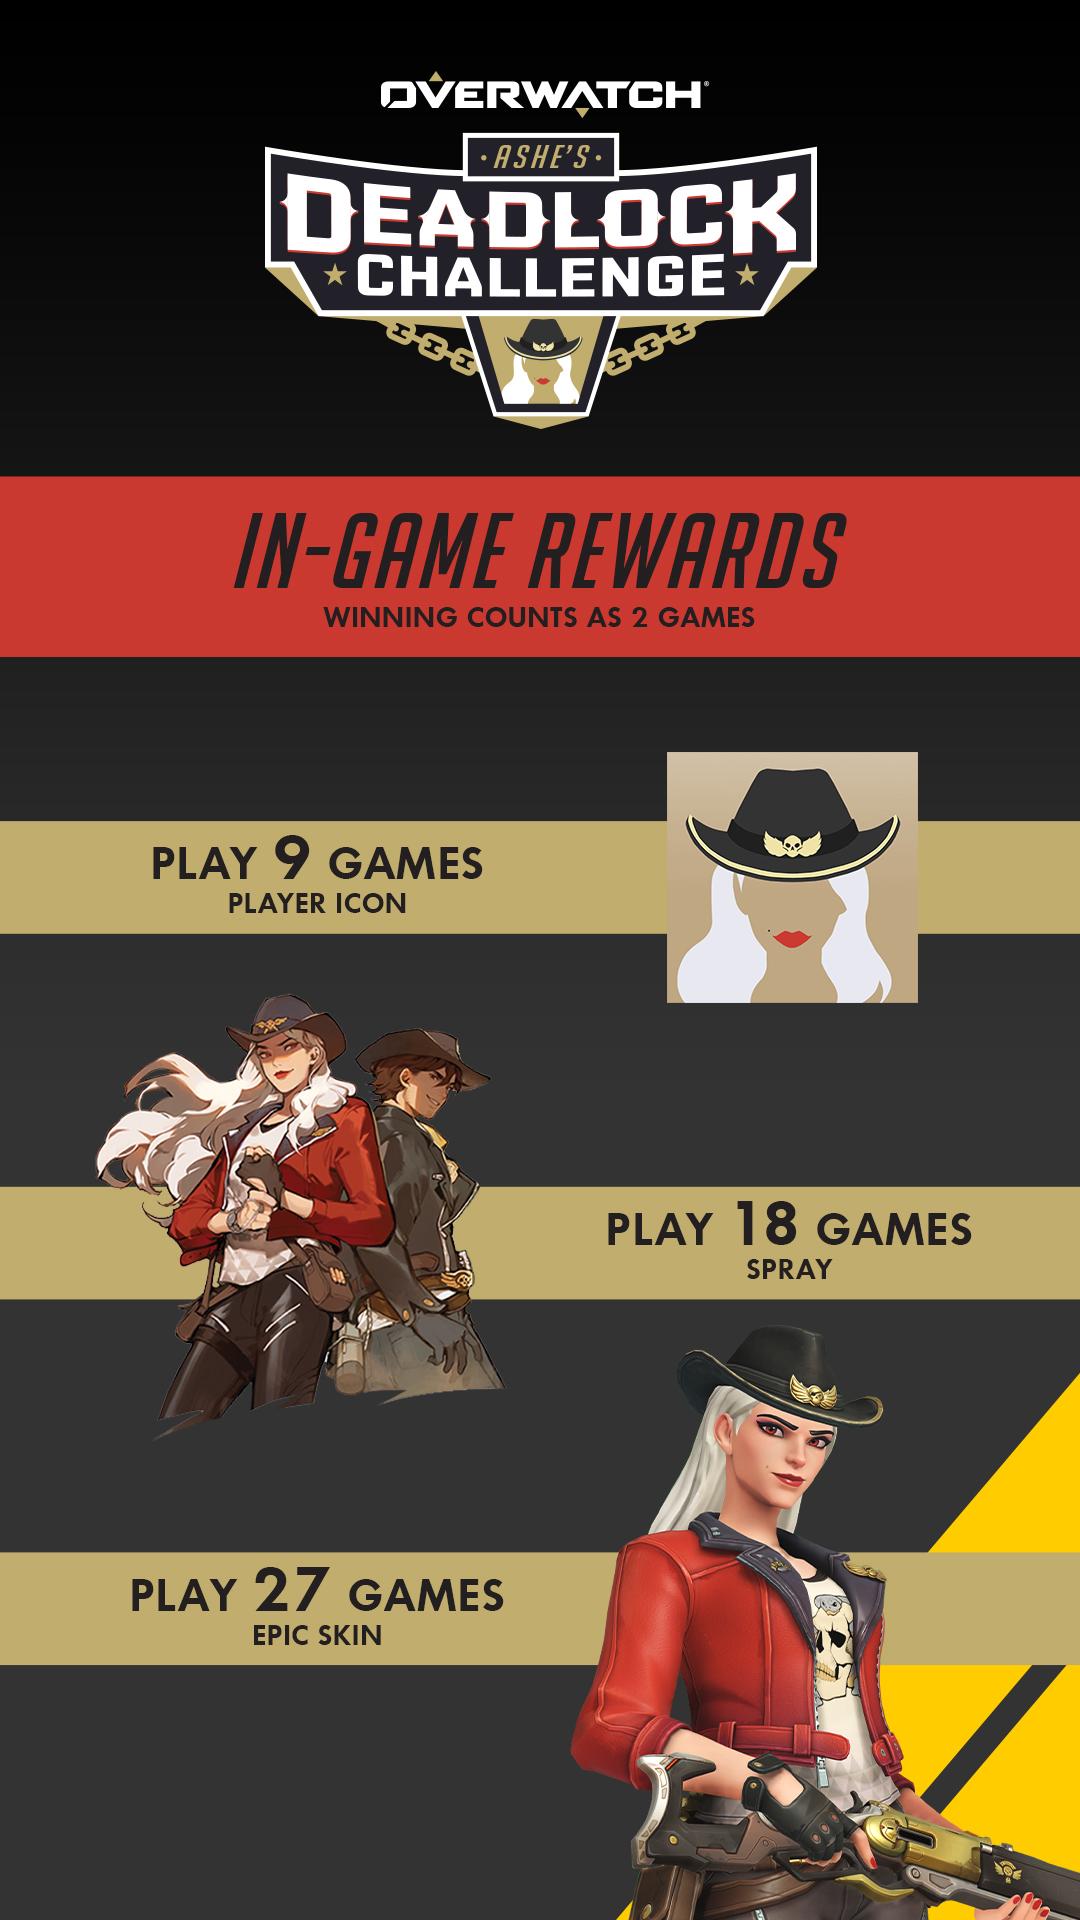 Zahrajte si Overwatch s crossplayem Odmeny